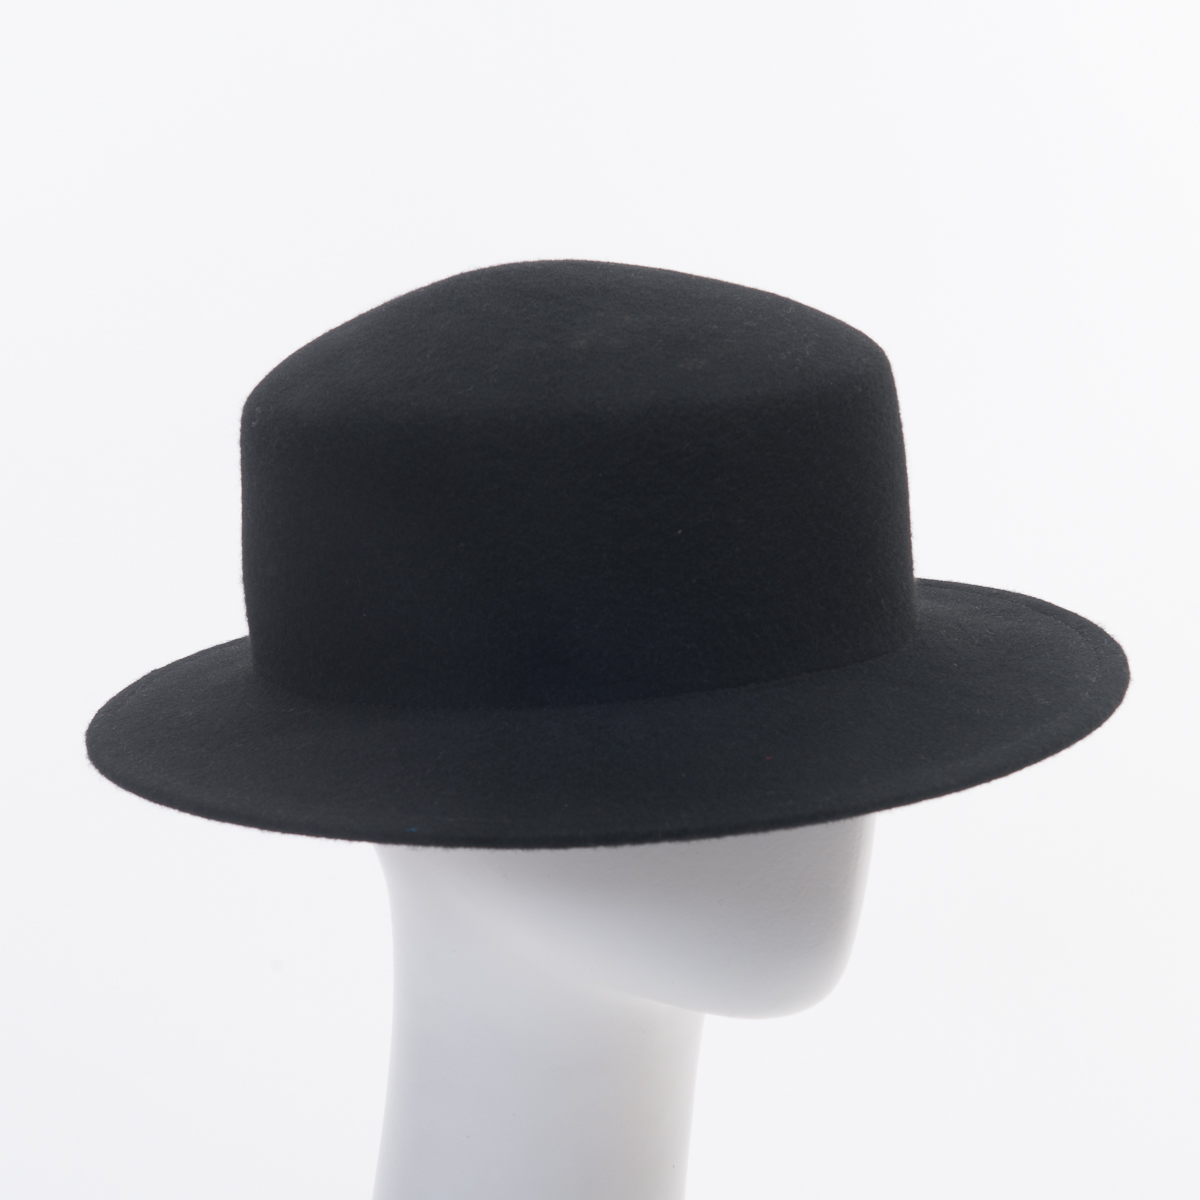 32bdaedf4bcb2 Black Small Brim Boater Felt Plain Hats-W0164A-BLACK- Sun Yorkos | Zoria